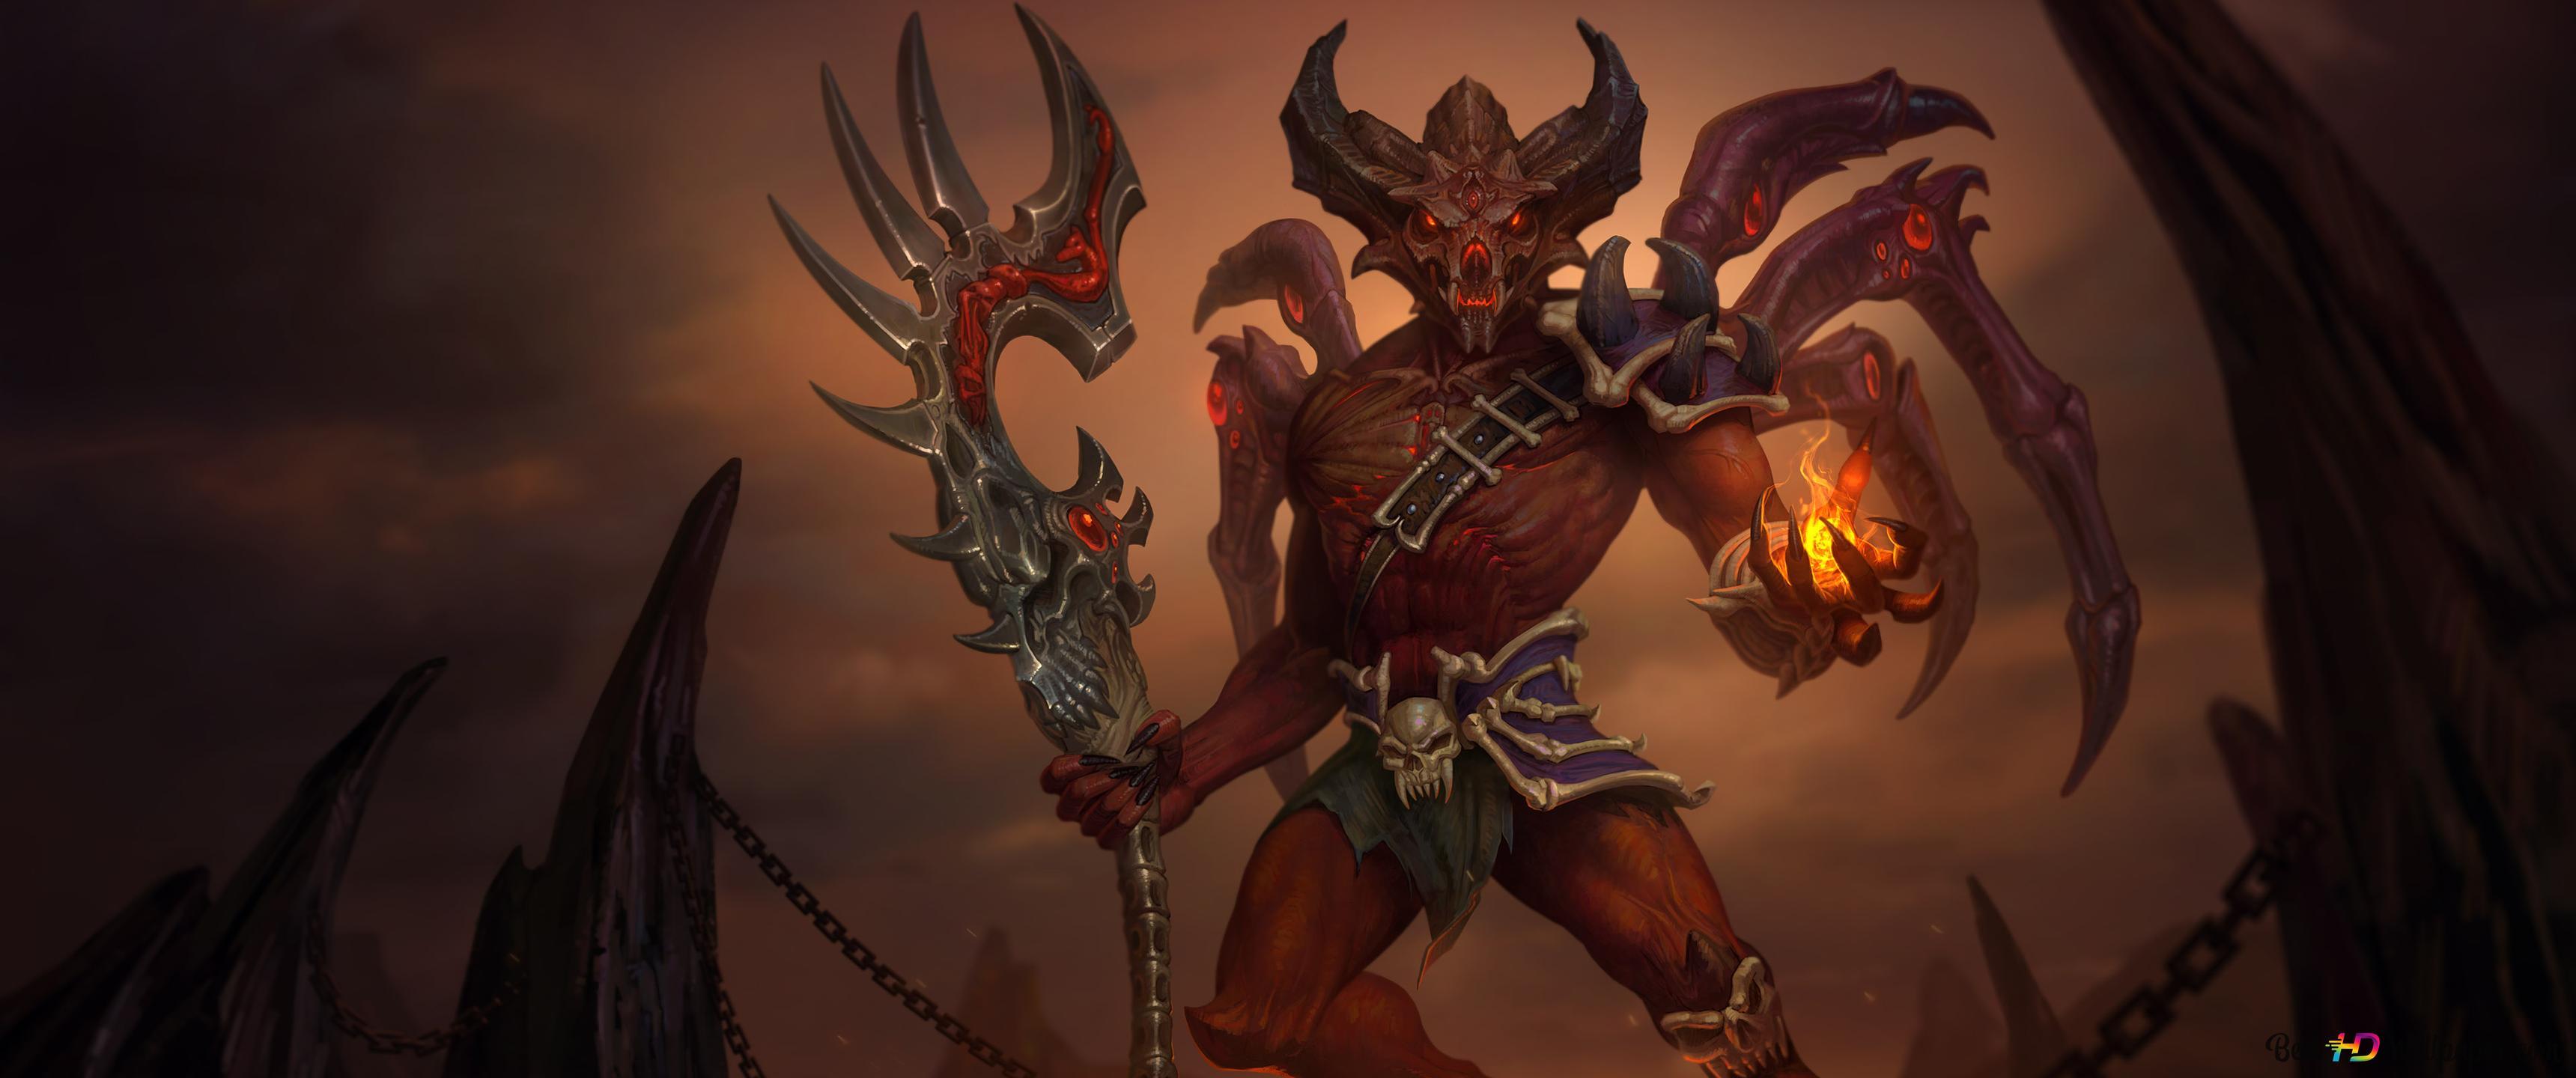 Smite Demonic Anubis Hd Wallpaper Download